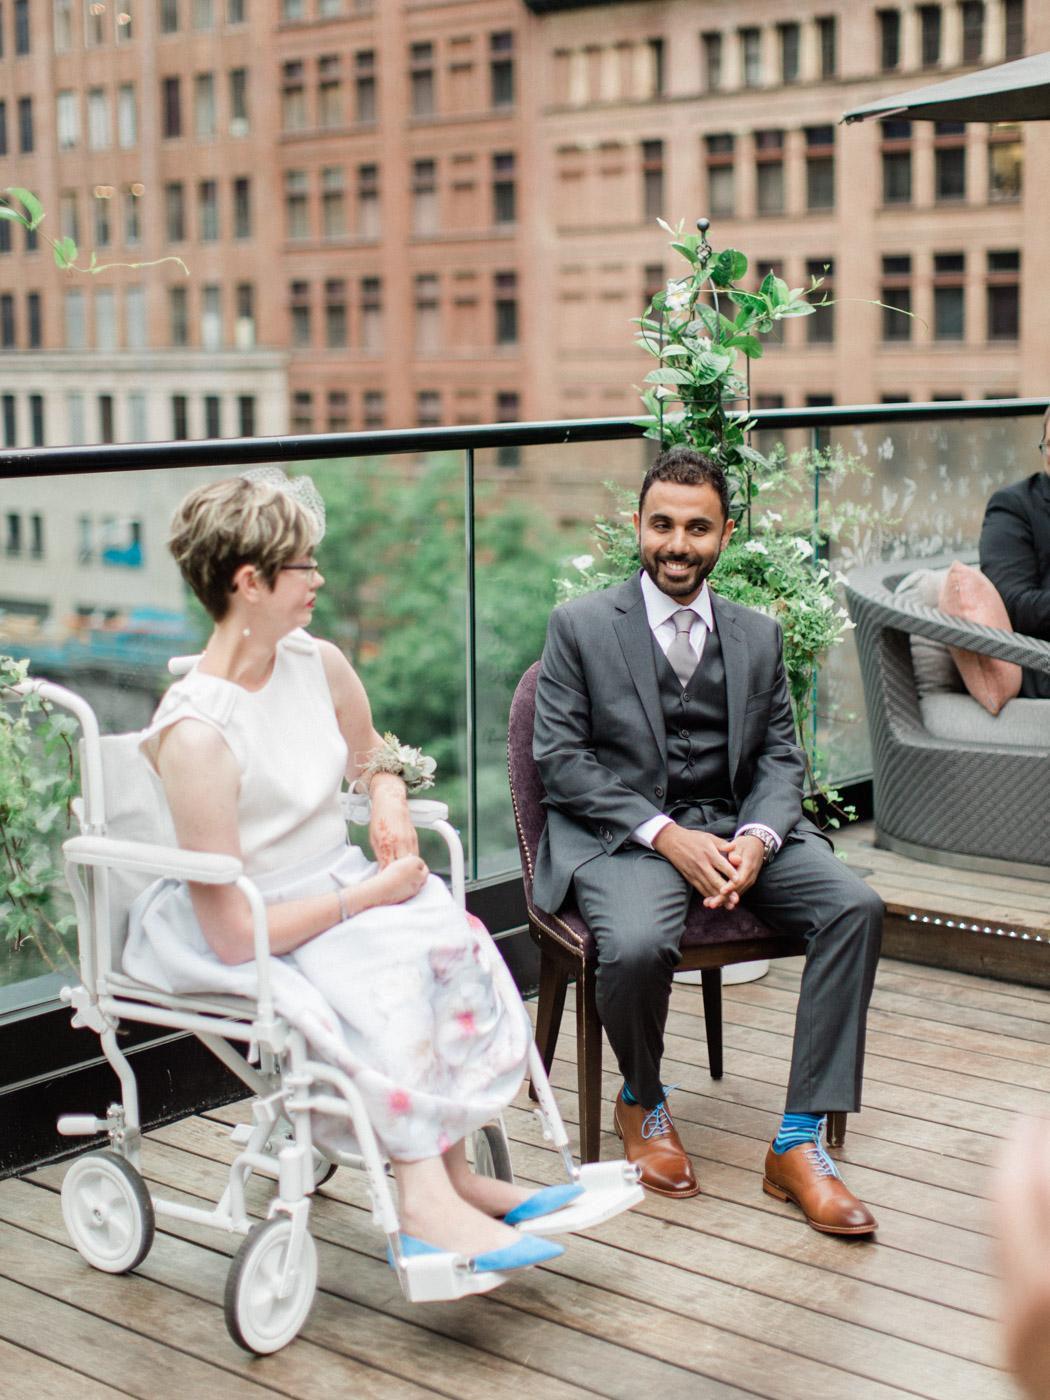 Toronto-wedding-photographer-intimate-restaurant-elopement-chase-oyster-downtown32.jpg